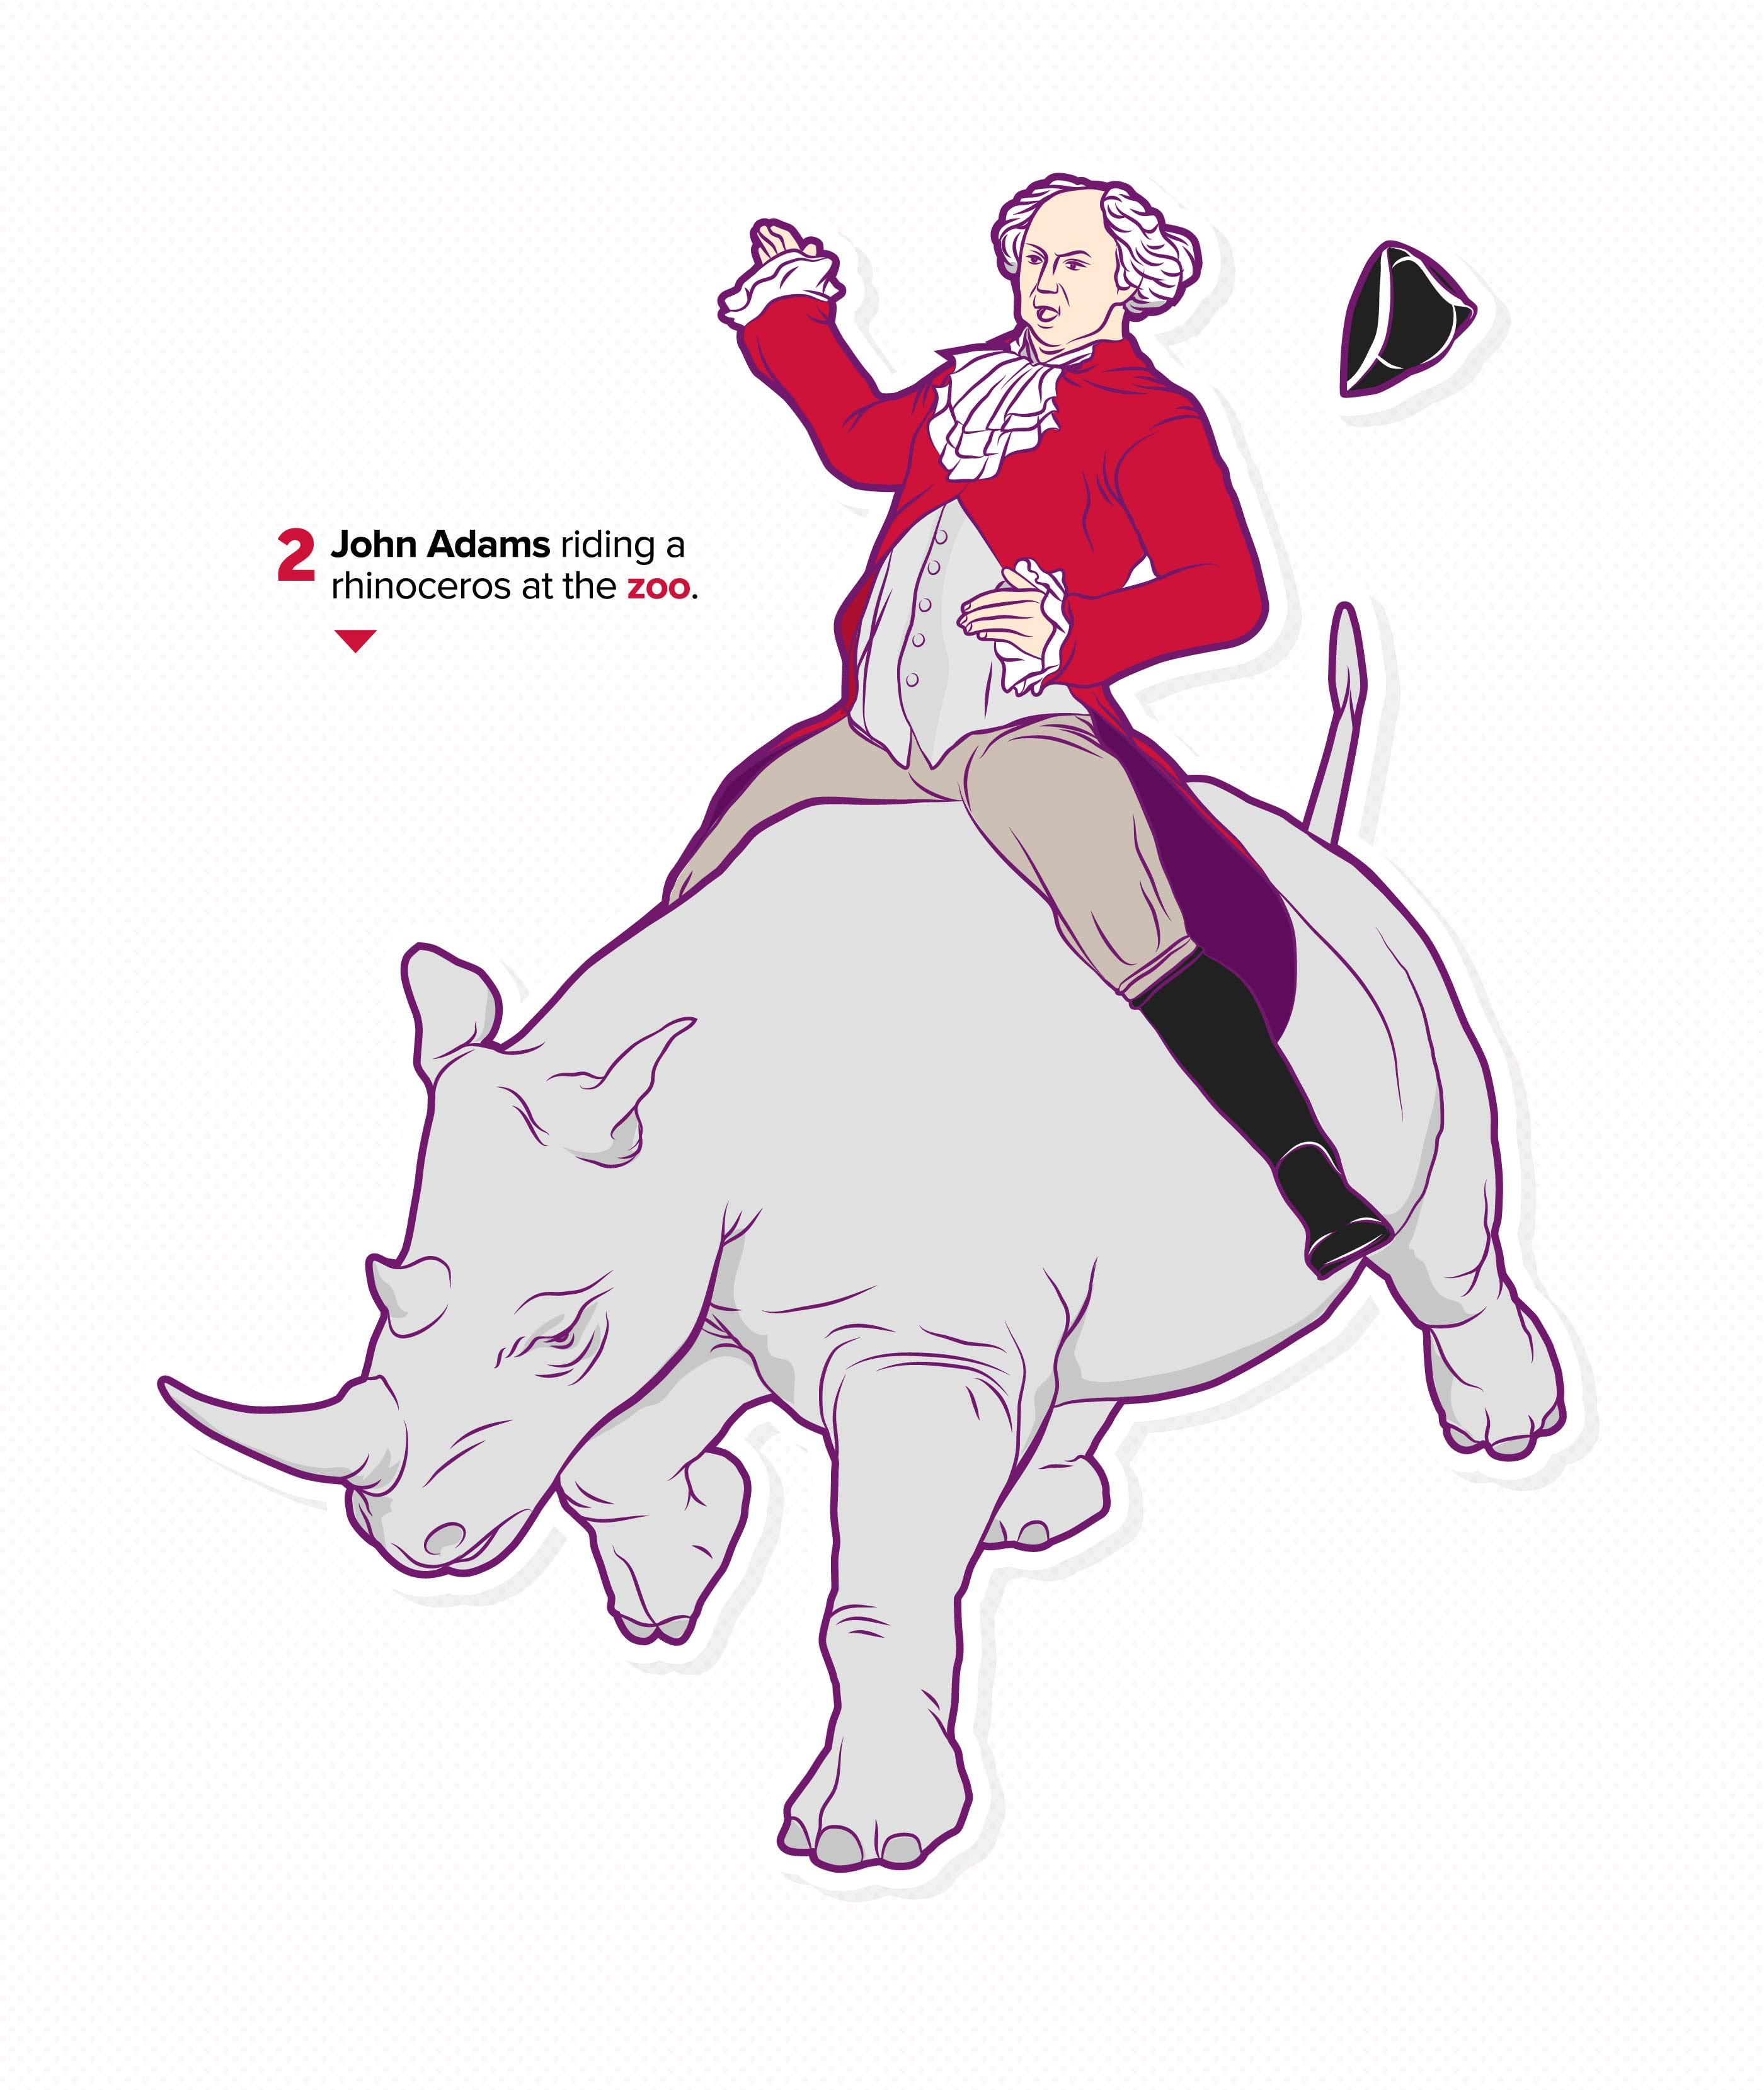 Virgin Mobile, Infographic Detail, John Adams riding a rhinoceros